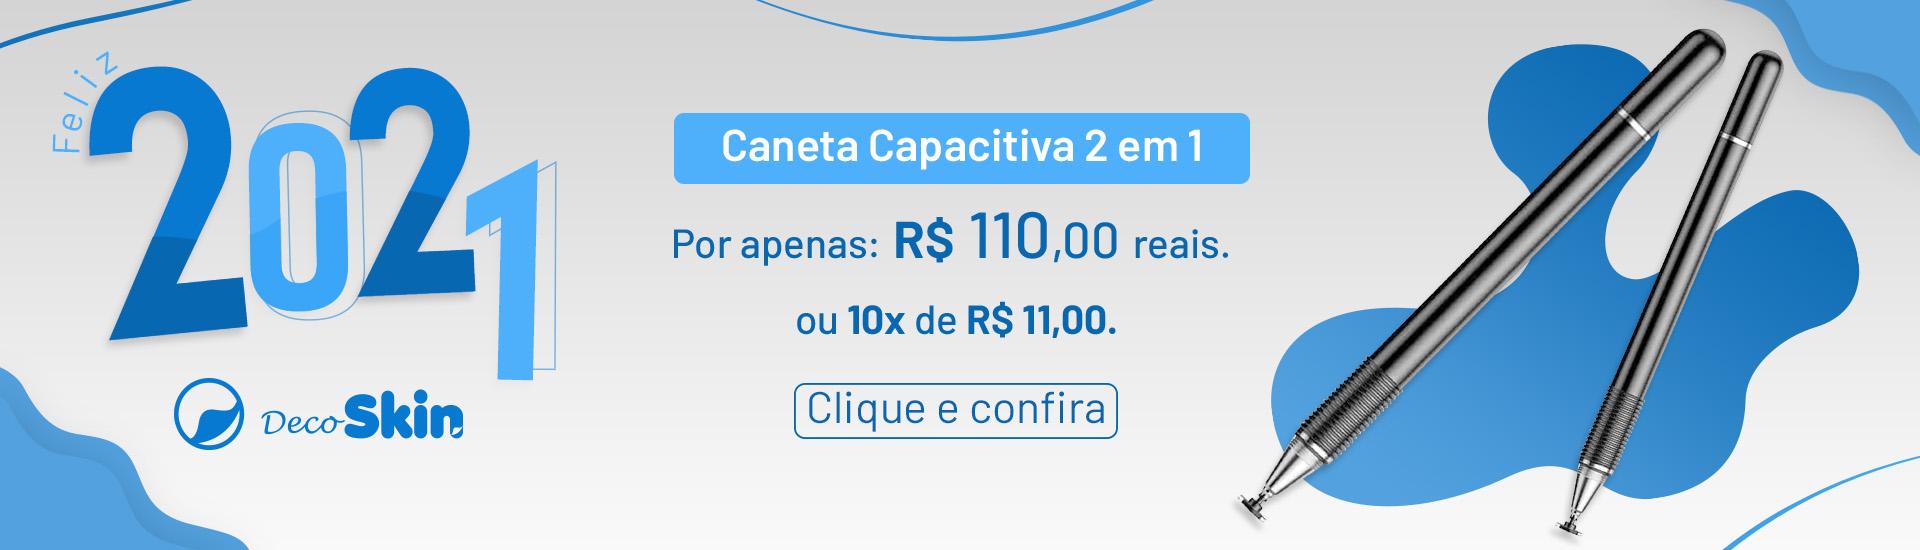 03 Caneta Capacitiva | Desktop 1920x550